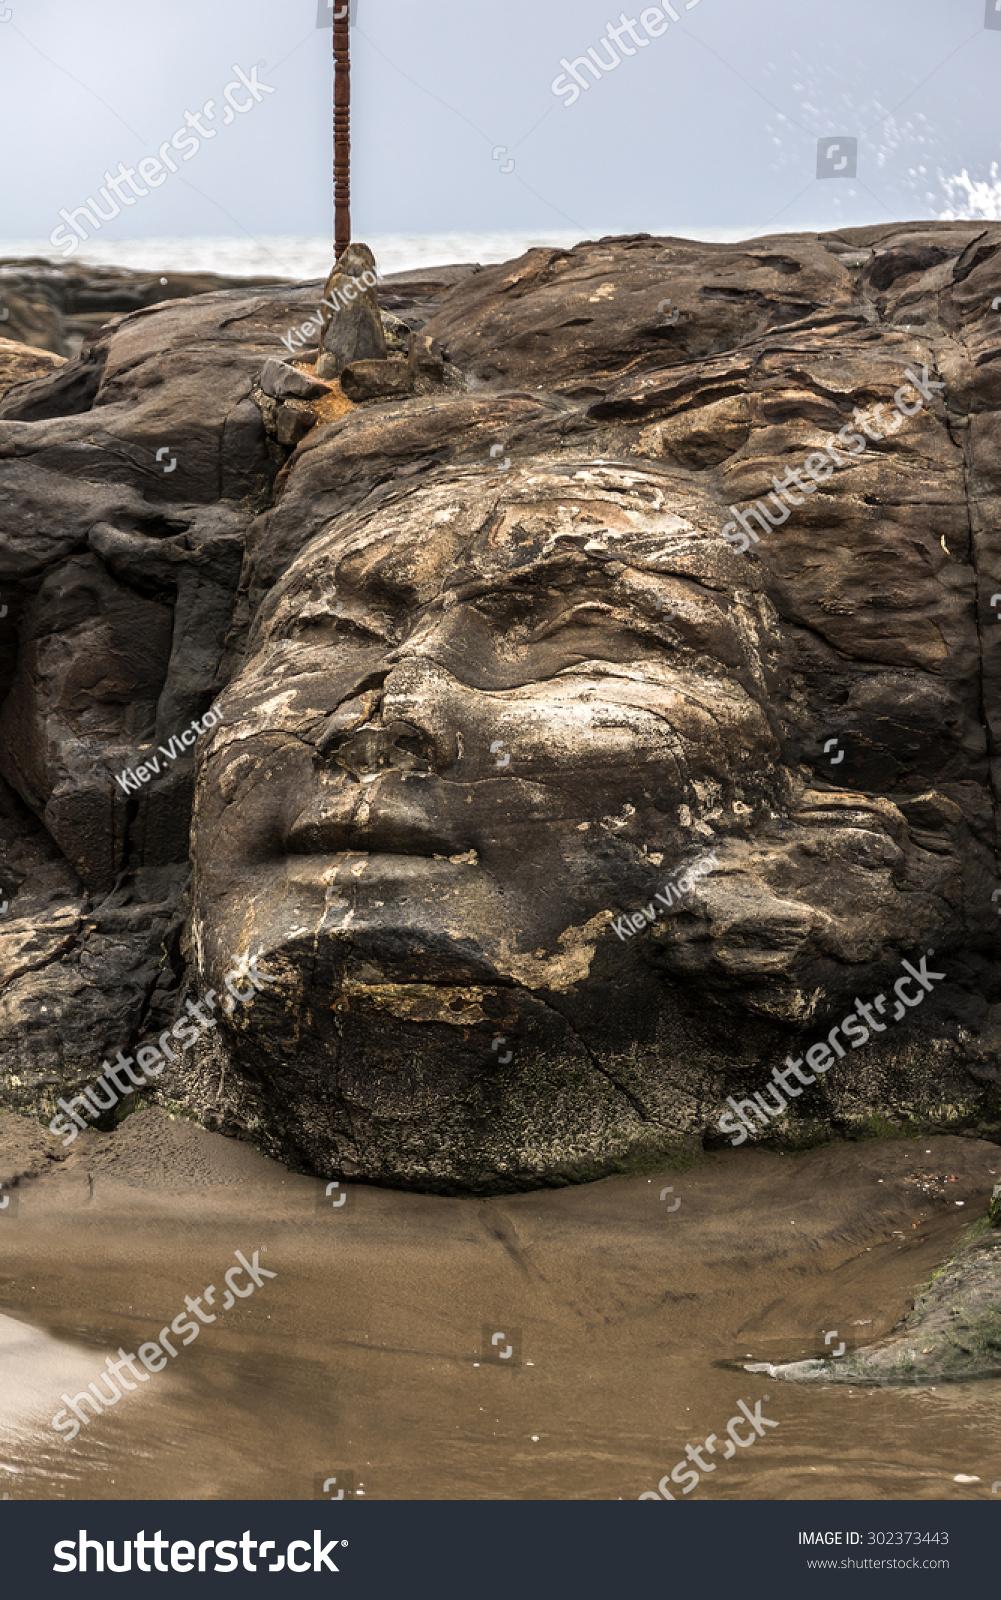 Shiva rock carving at little vagator beach goa india